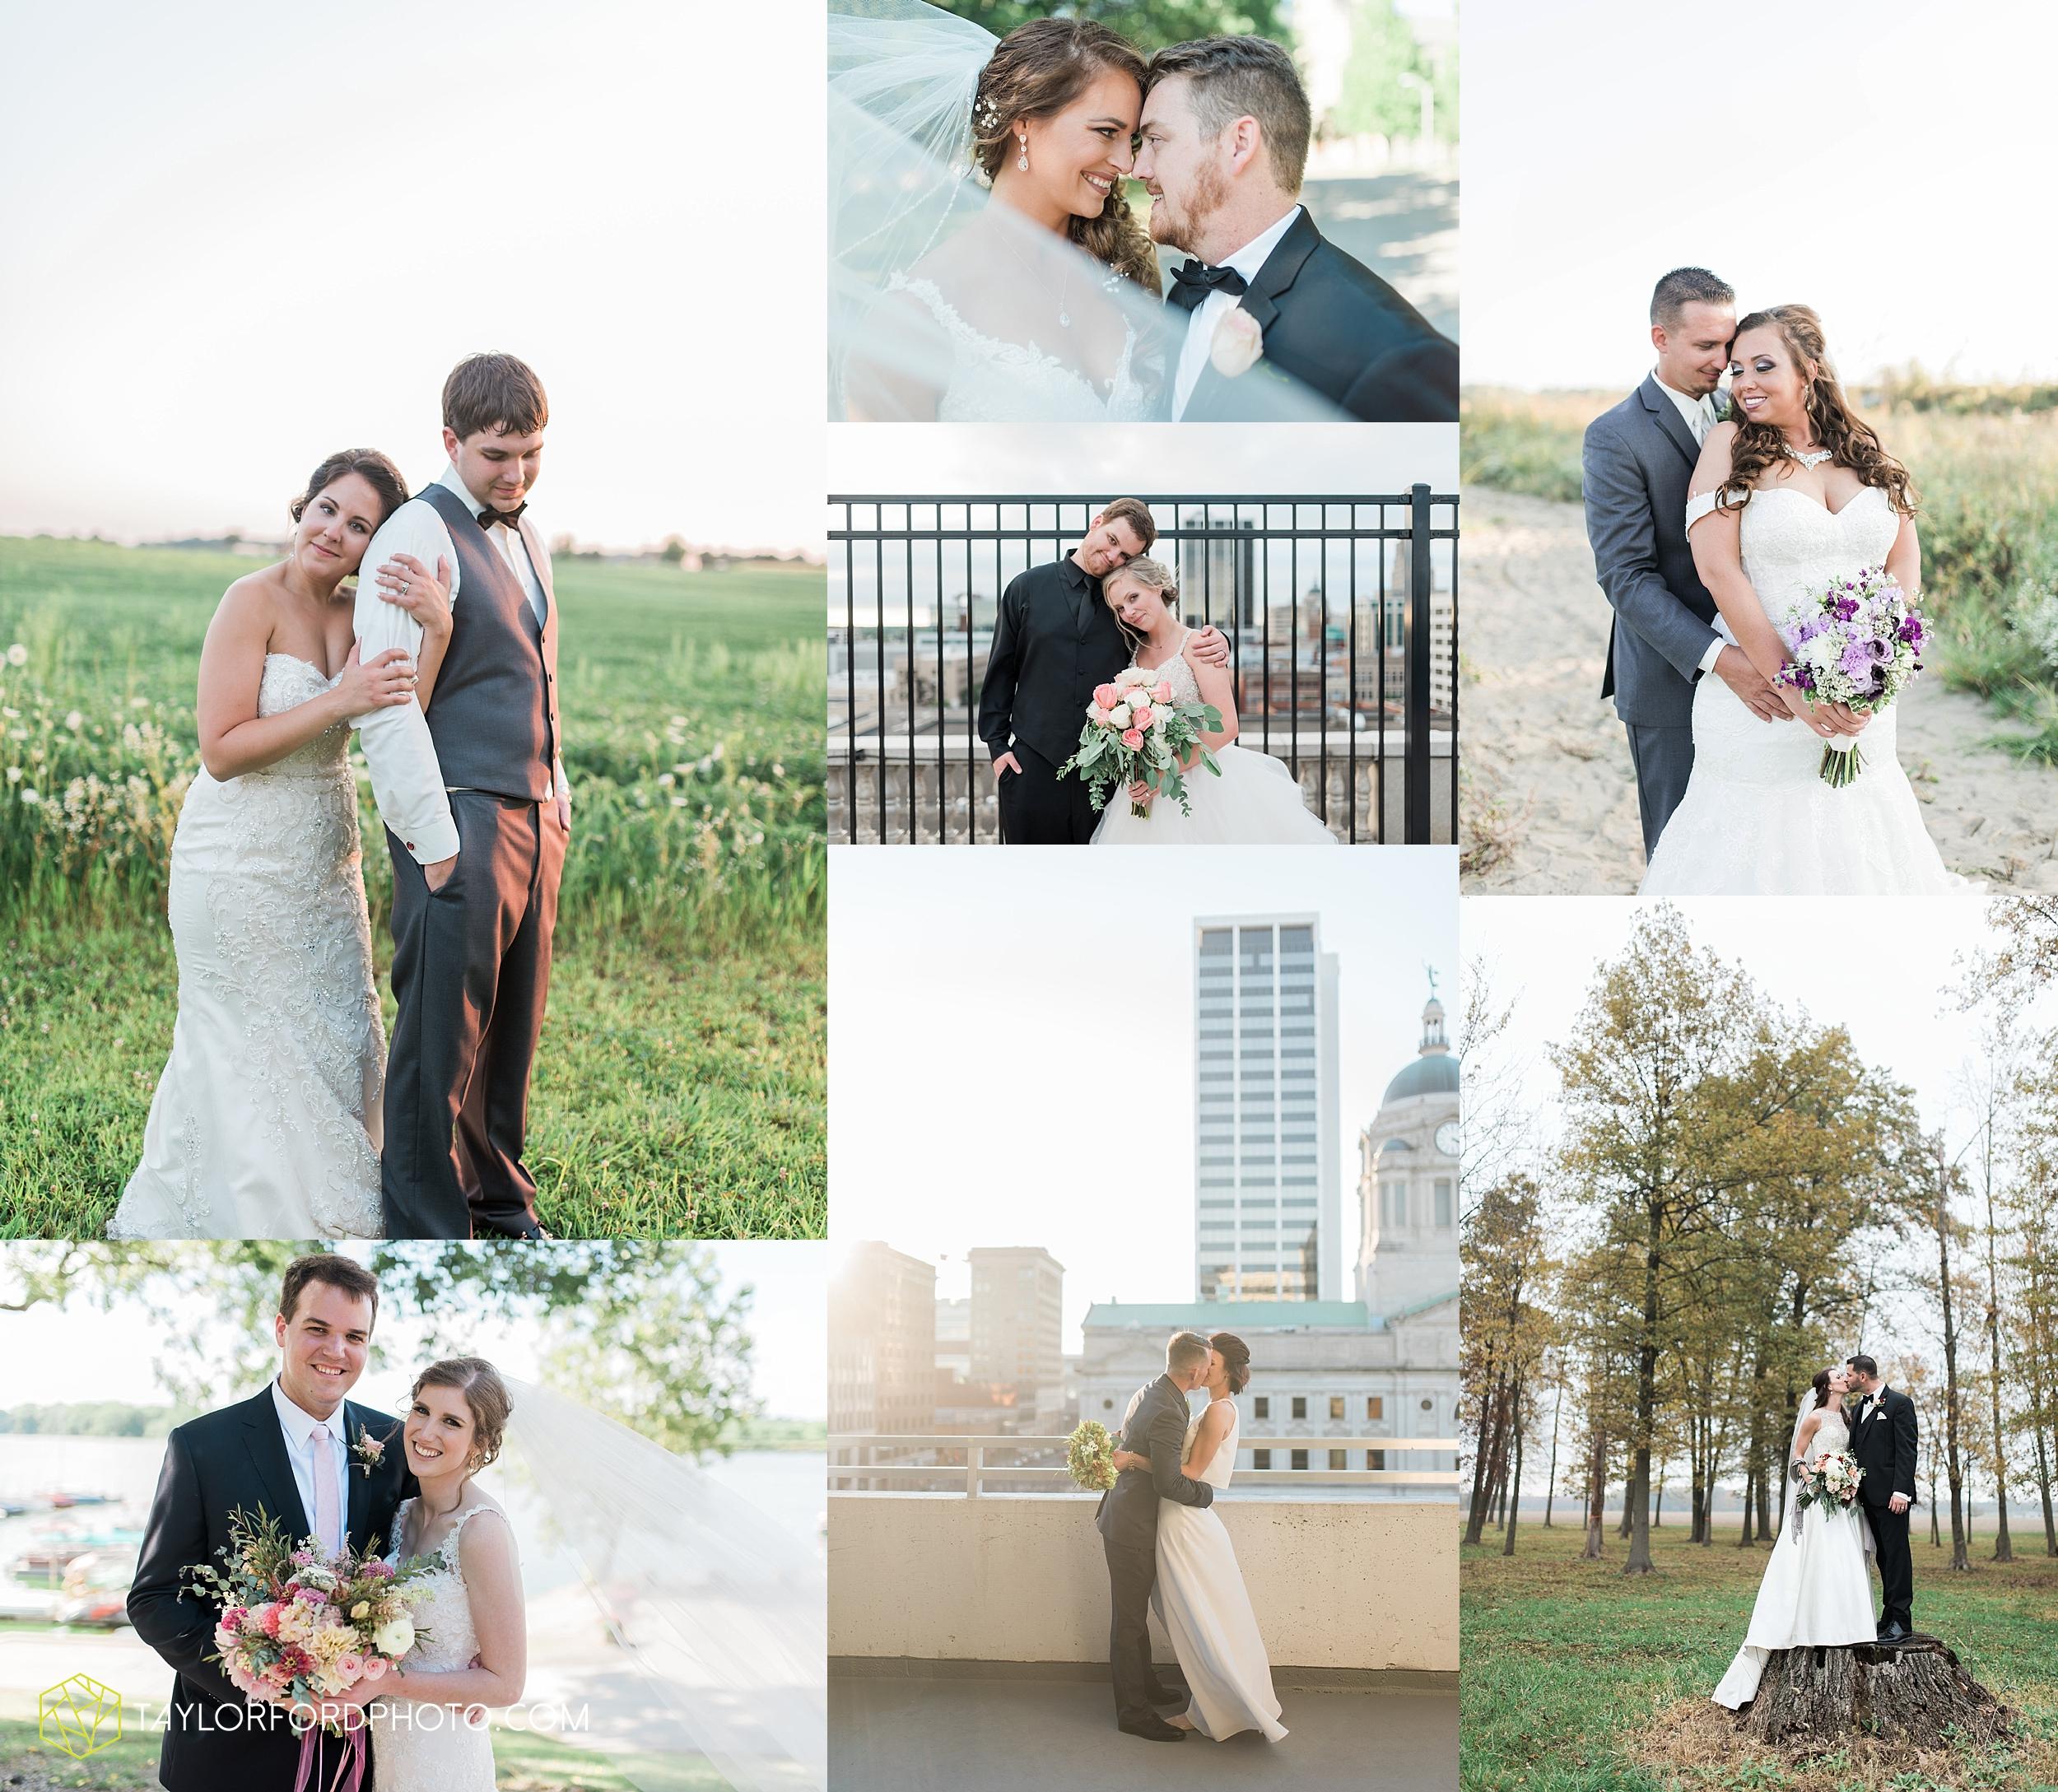 van-wert-ohio-fort-wayne-indiana-photographer-Taylor-Ford-Photography-wedding-engagement-family-senior_4412.jpg